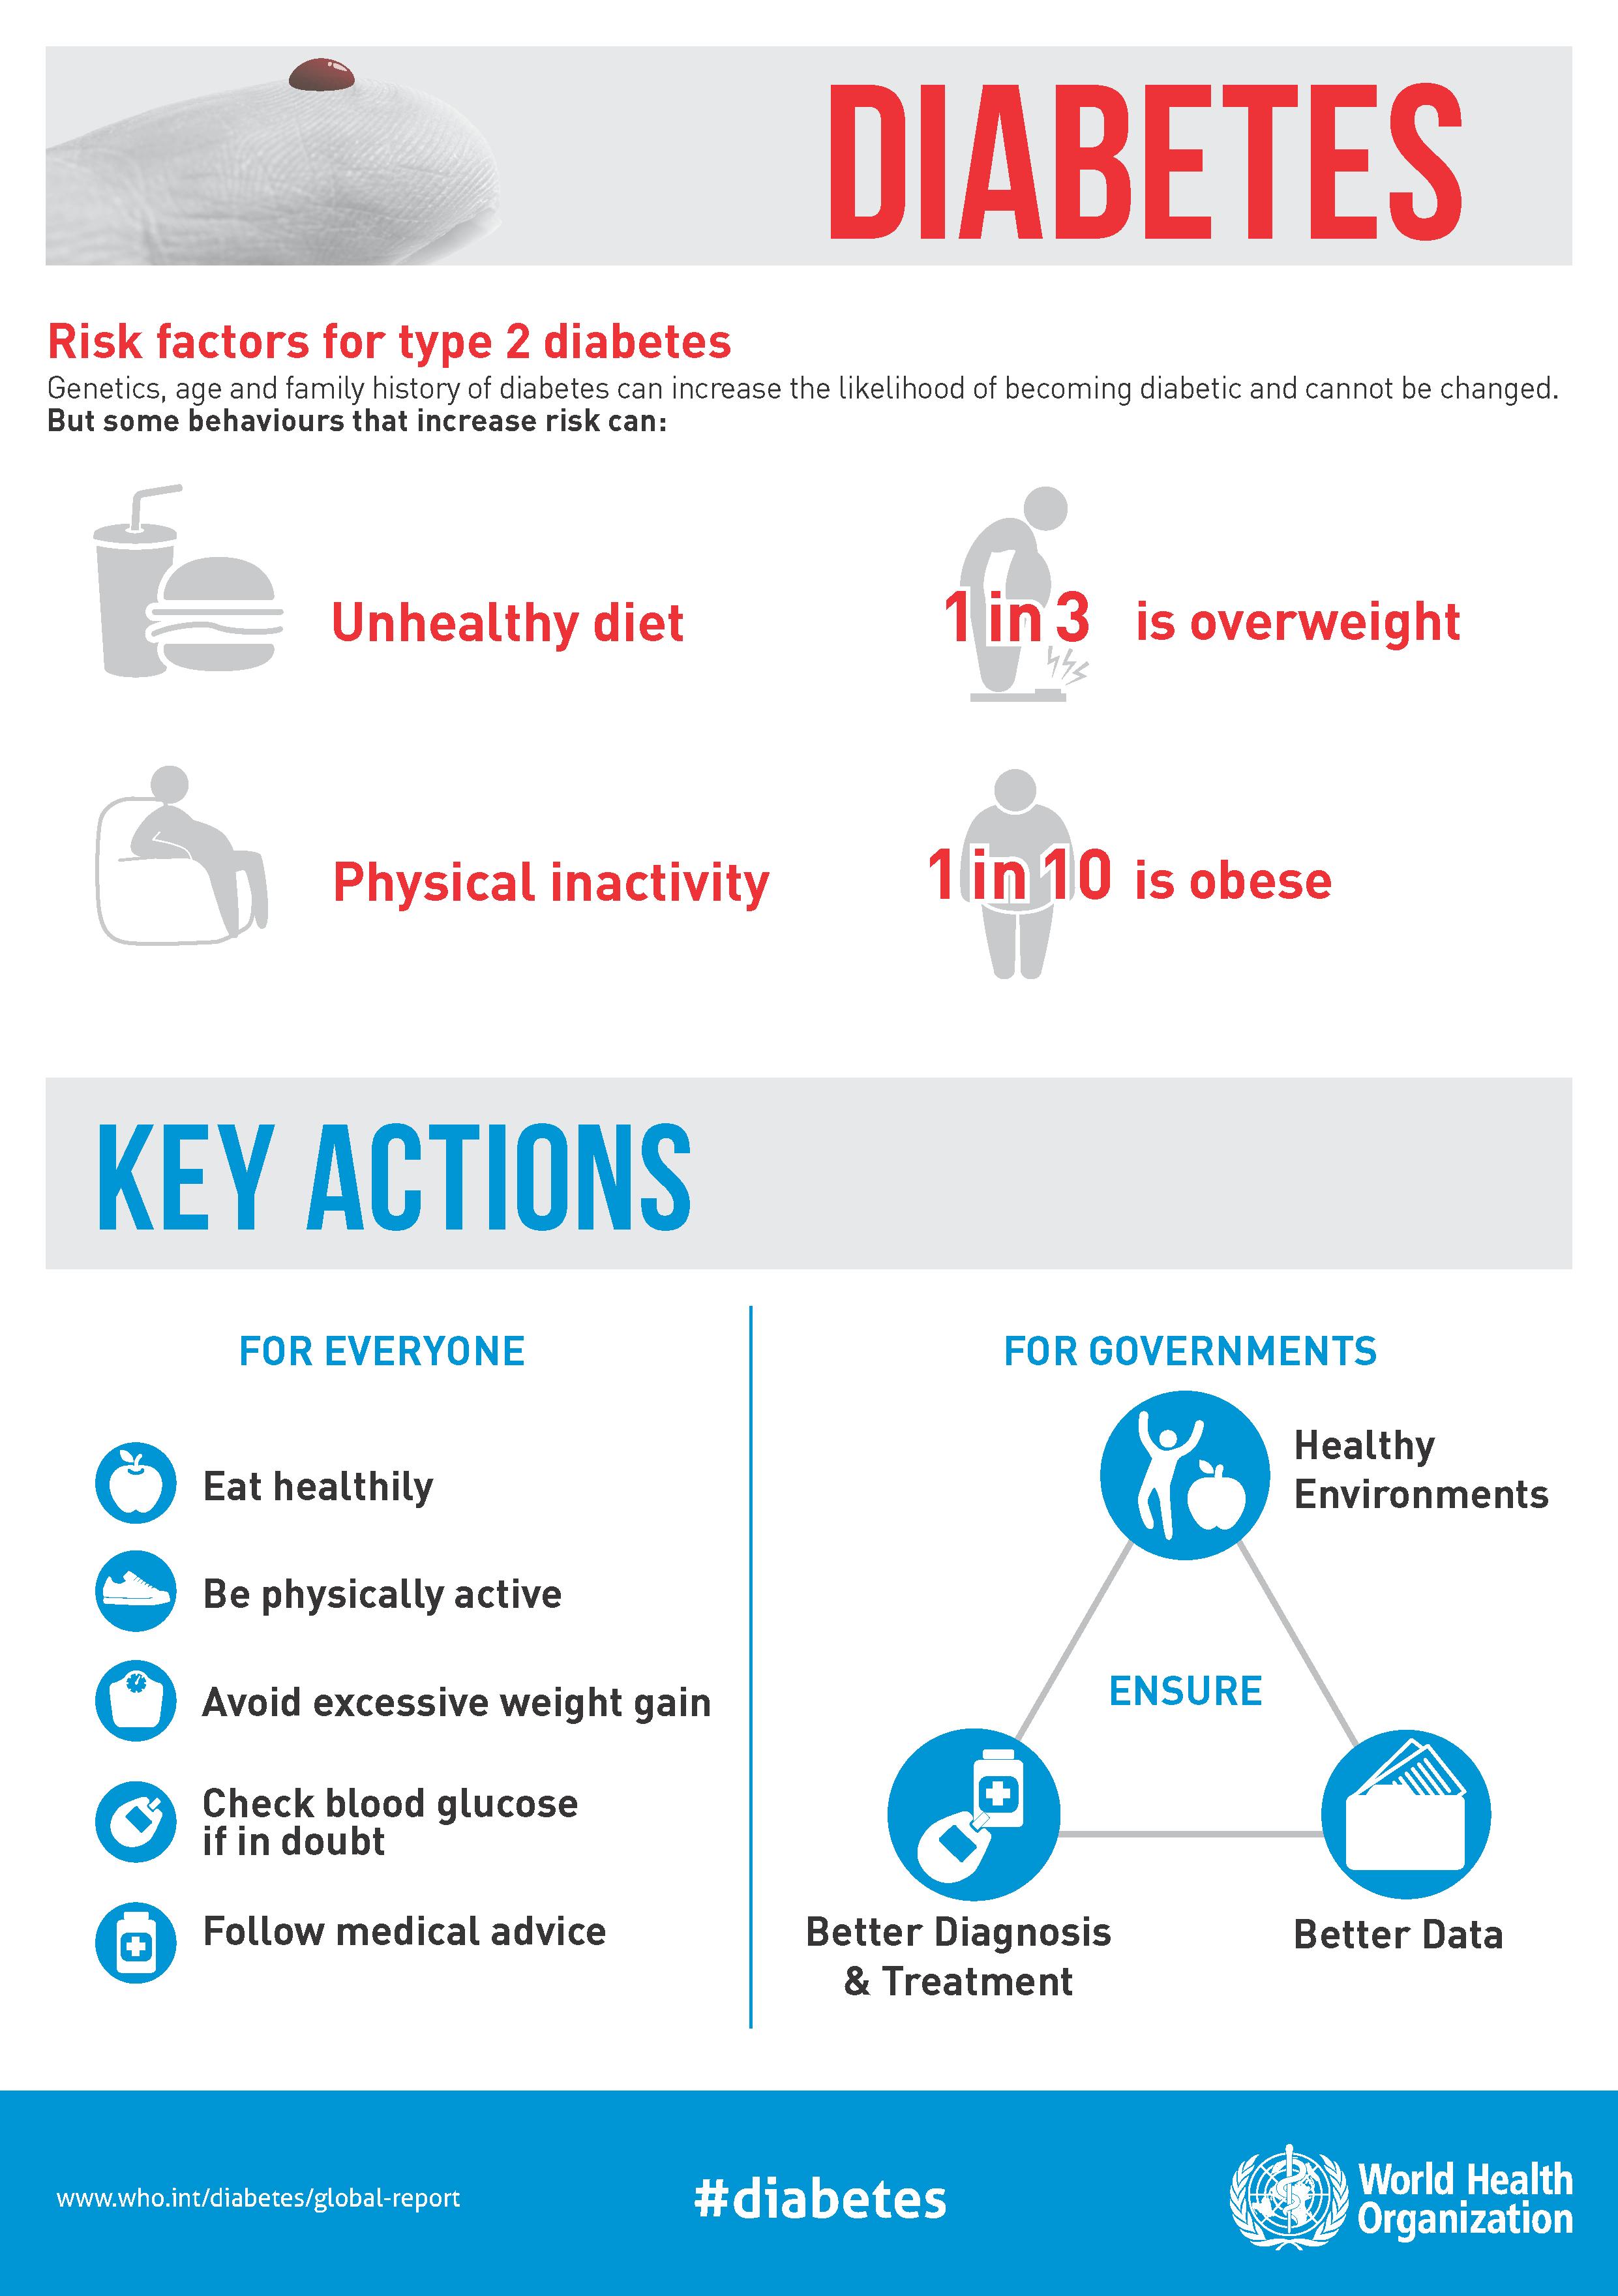 jdrf dia mundial de la diabetes 2020